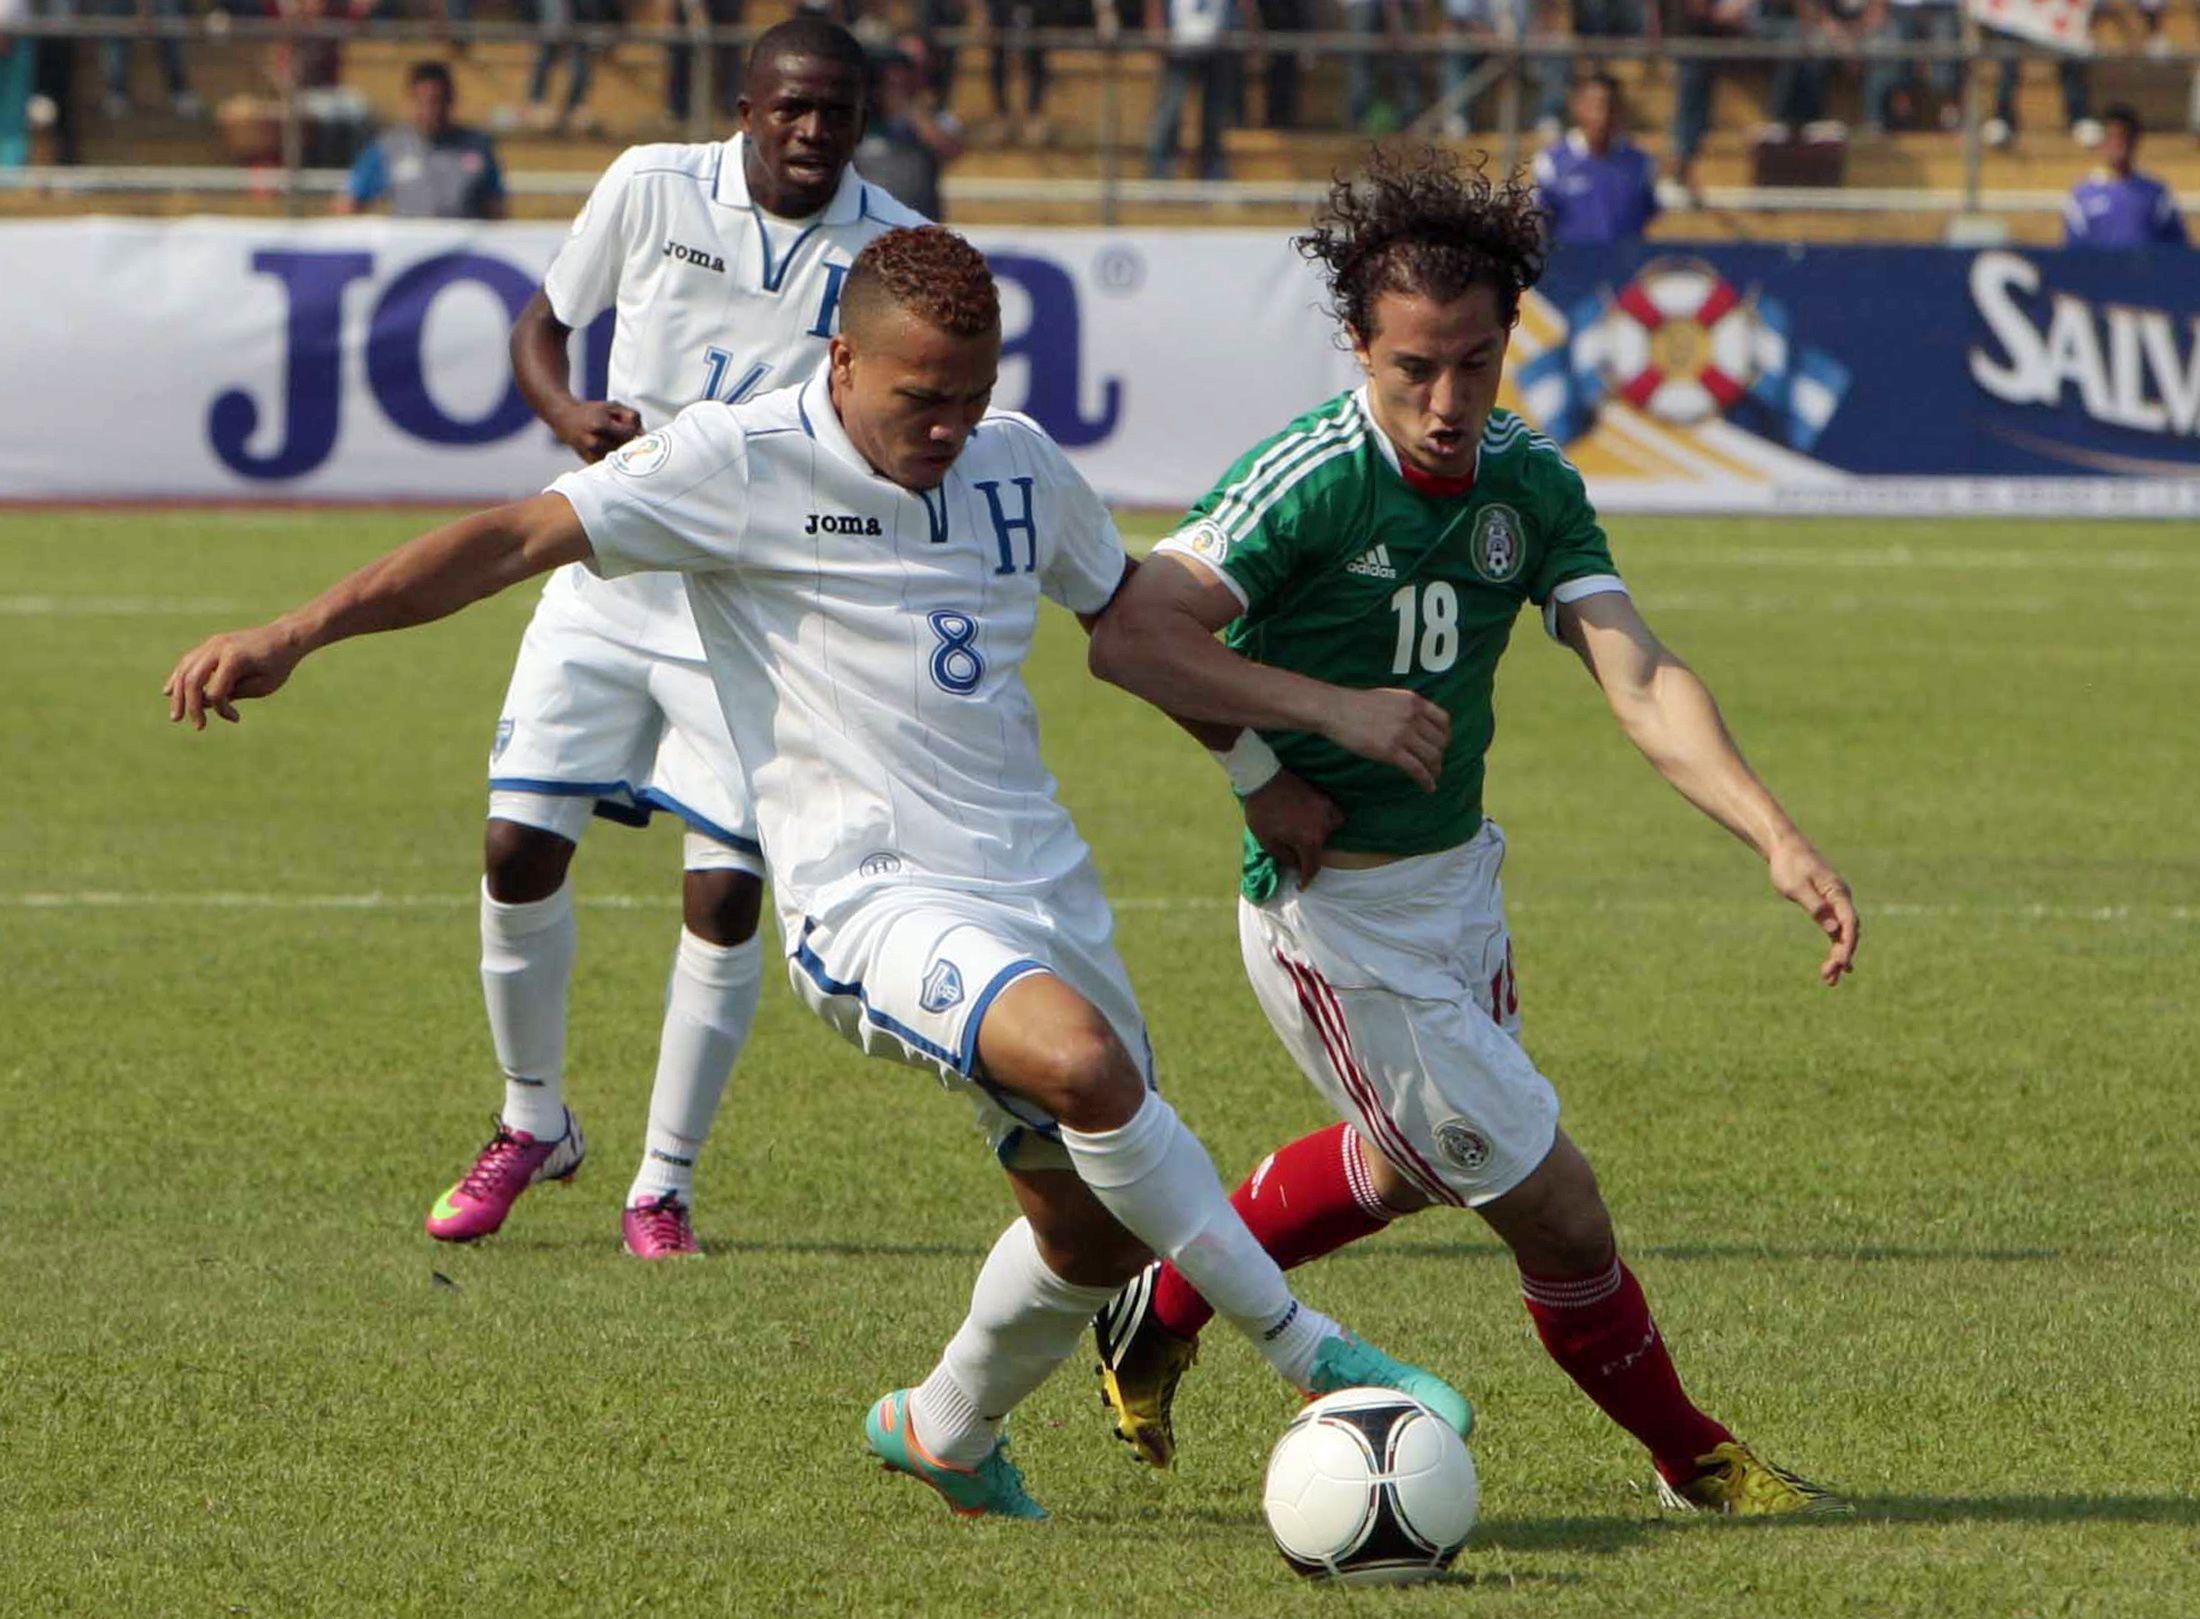 Honduran soccer star Arnold Peralta killed